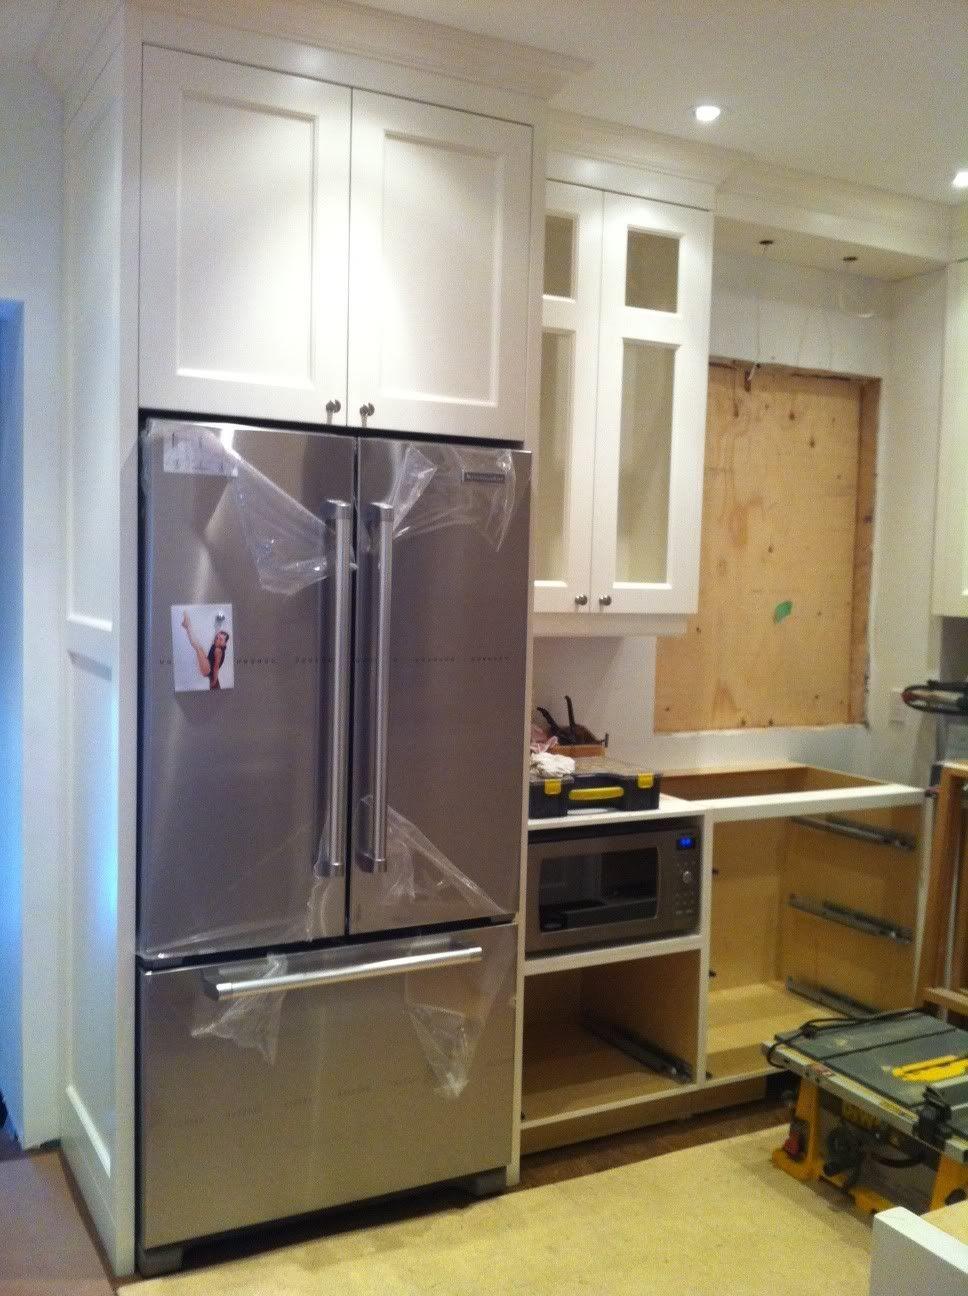 Non counter depth fridge  Kitchen  Kitchen refrigerator